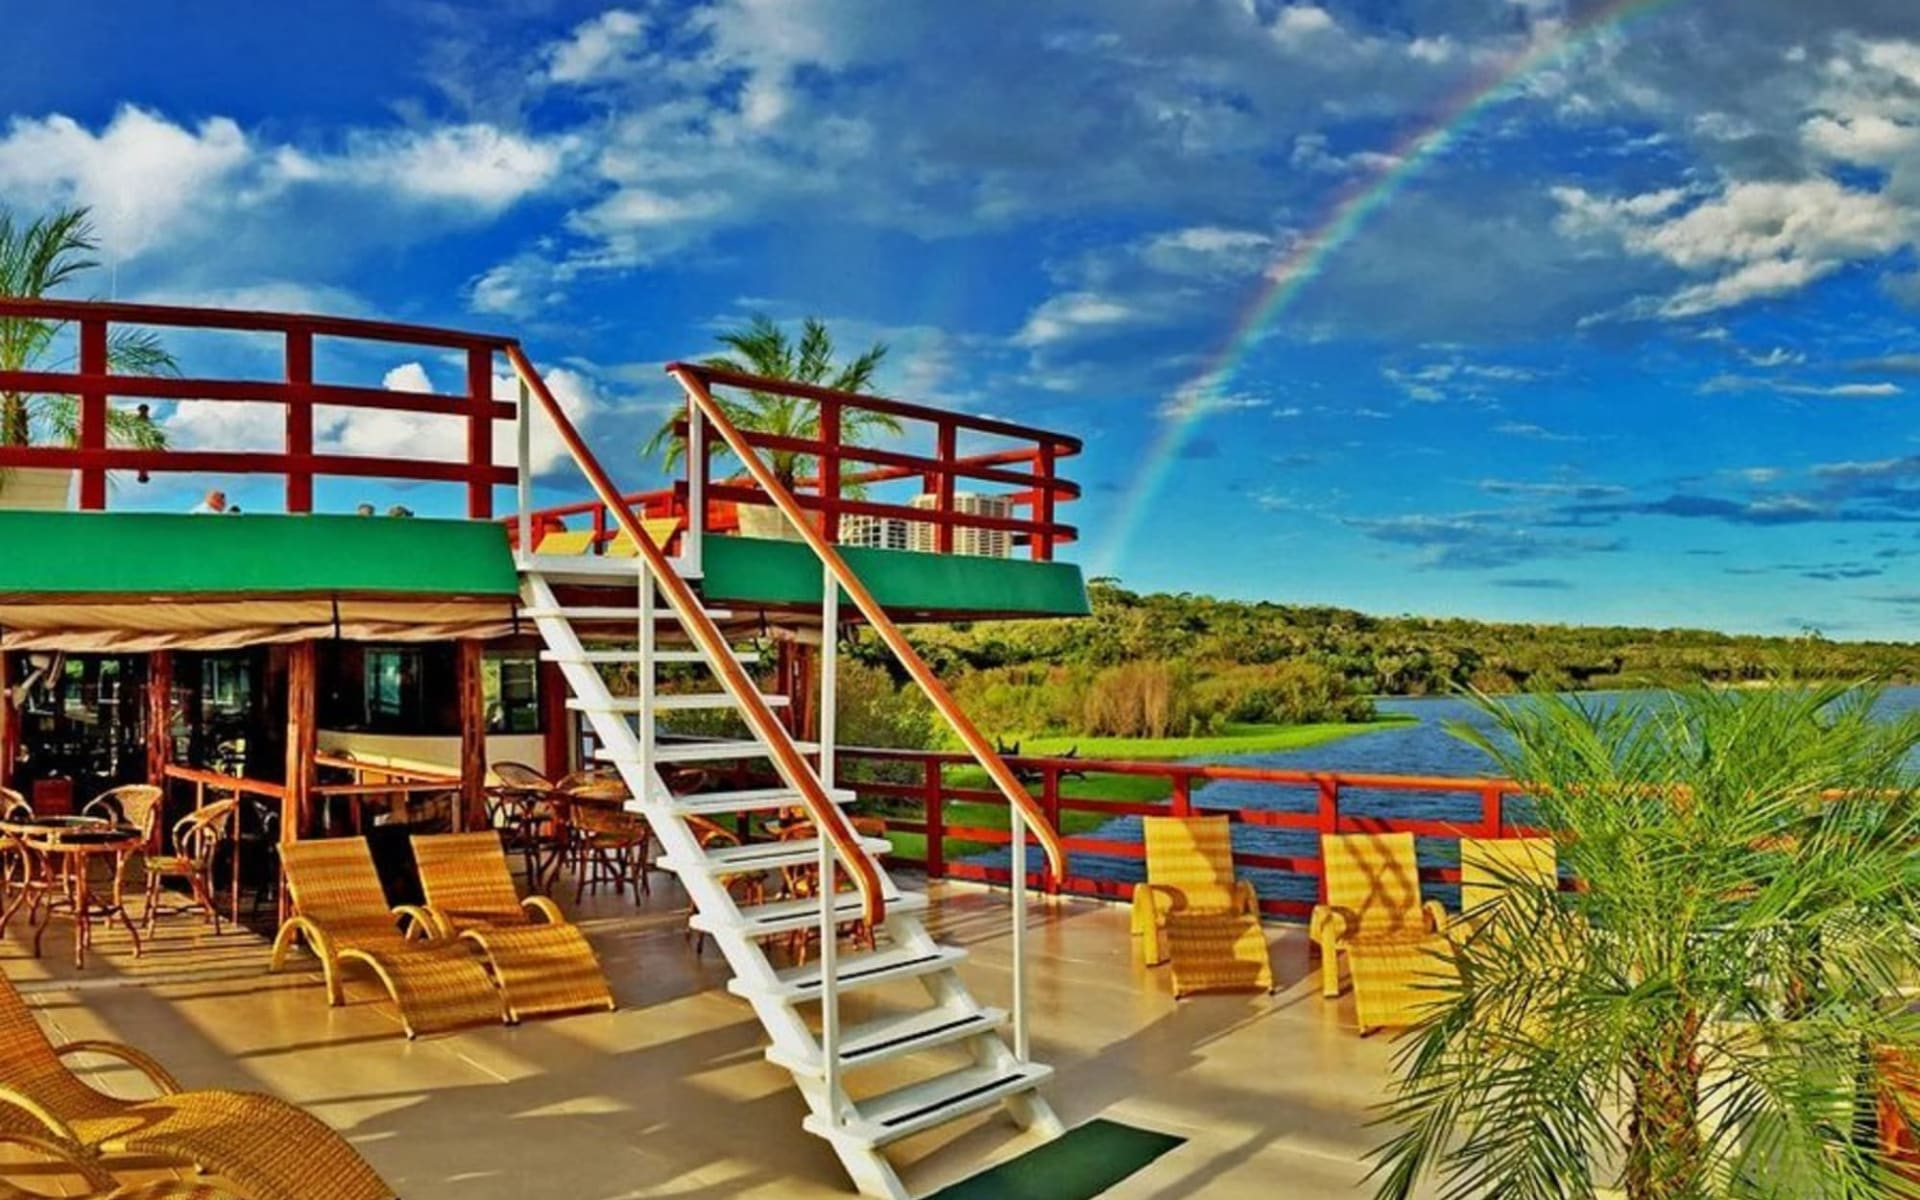 Flussfahrt Amazon Clipper Cruises / Rio Negro ab Manaus: Clipper Deck mit Regenbogen